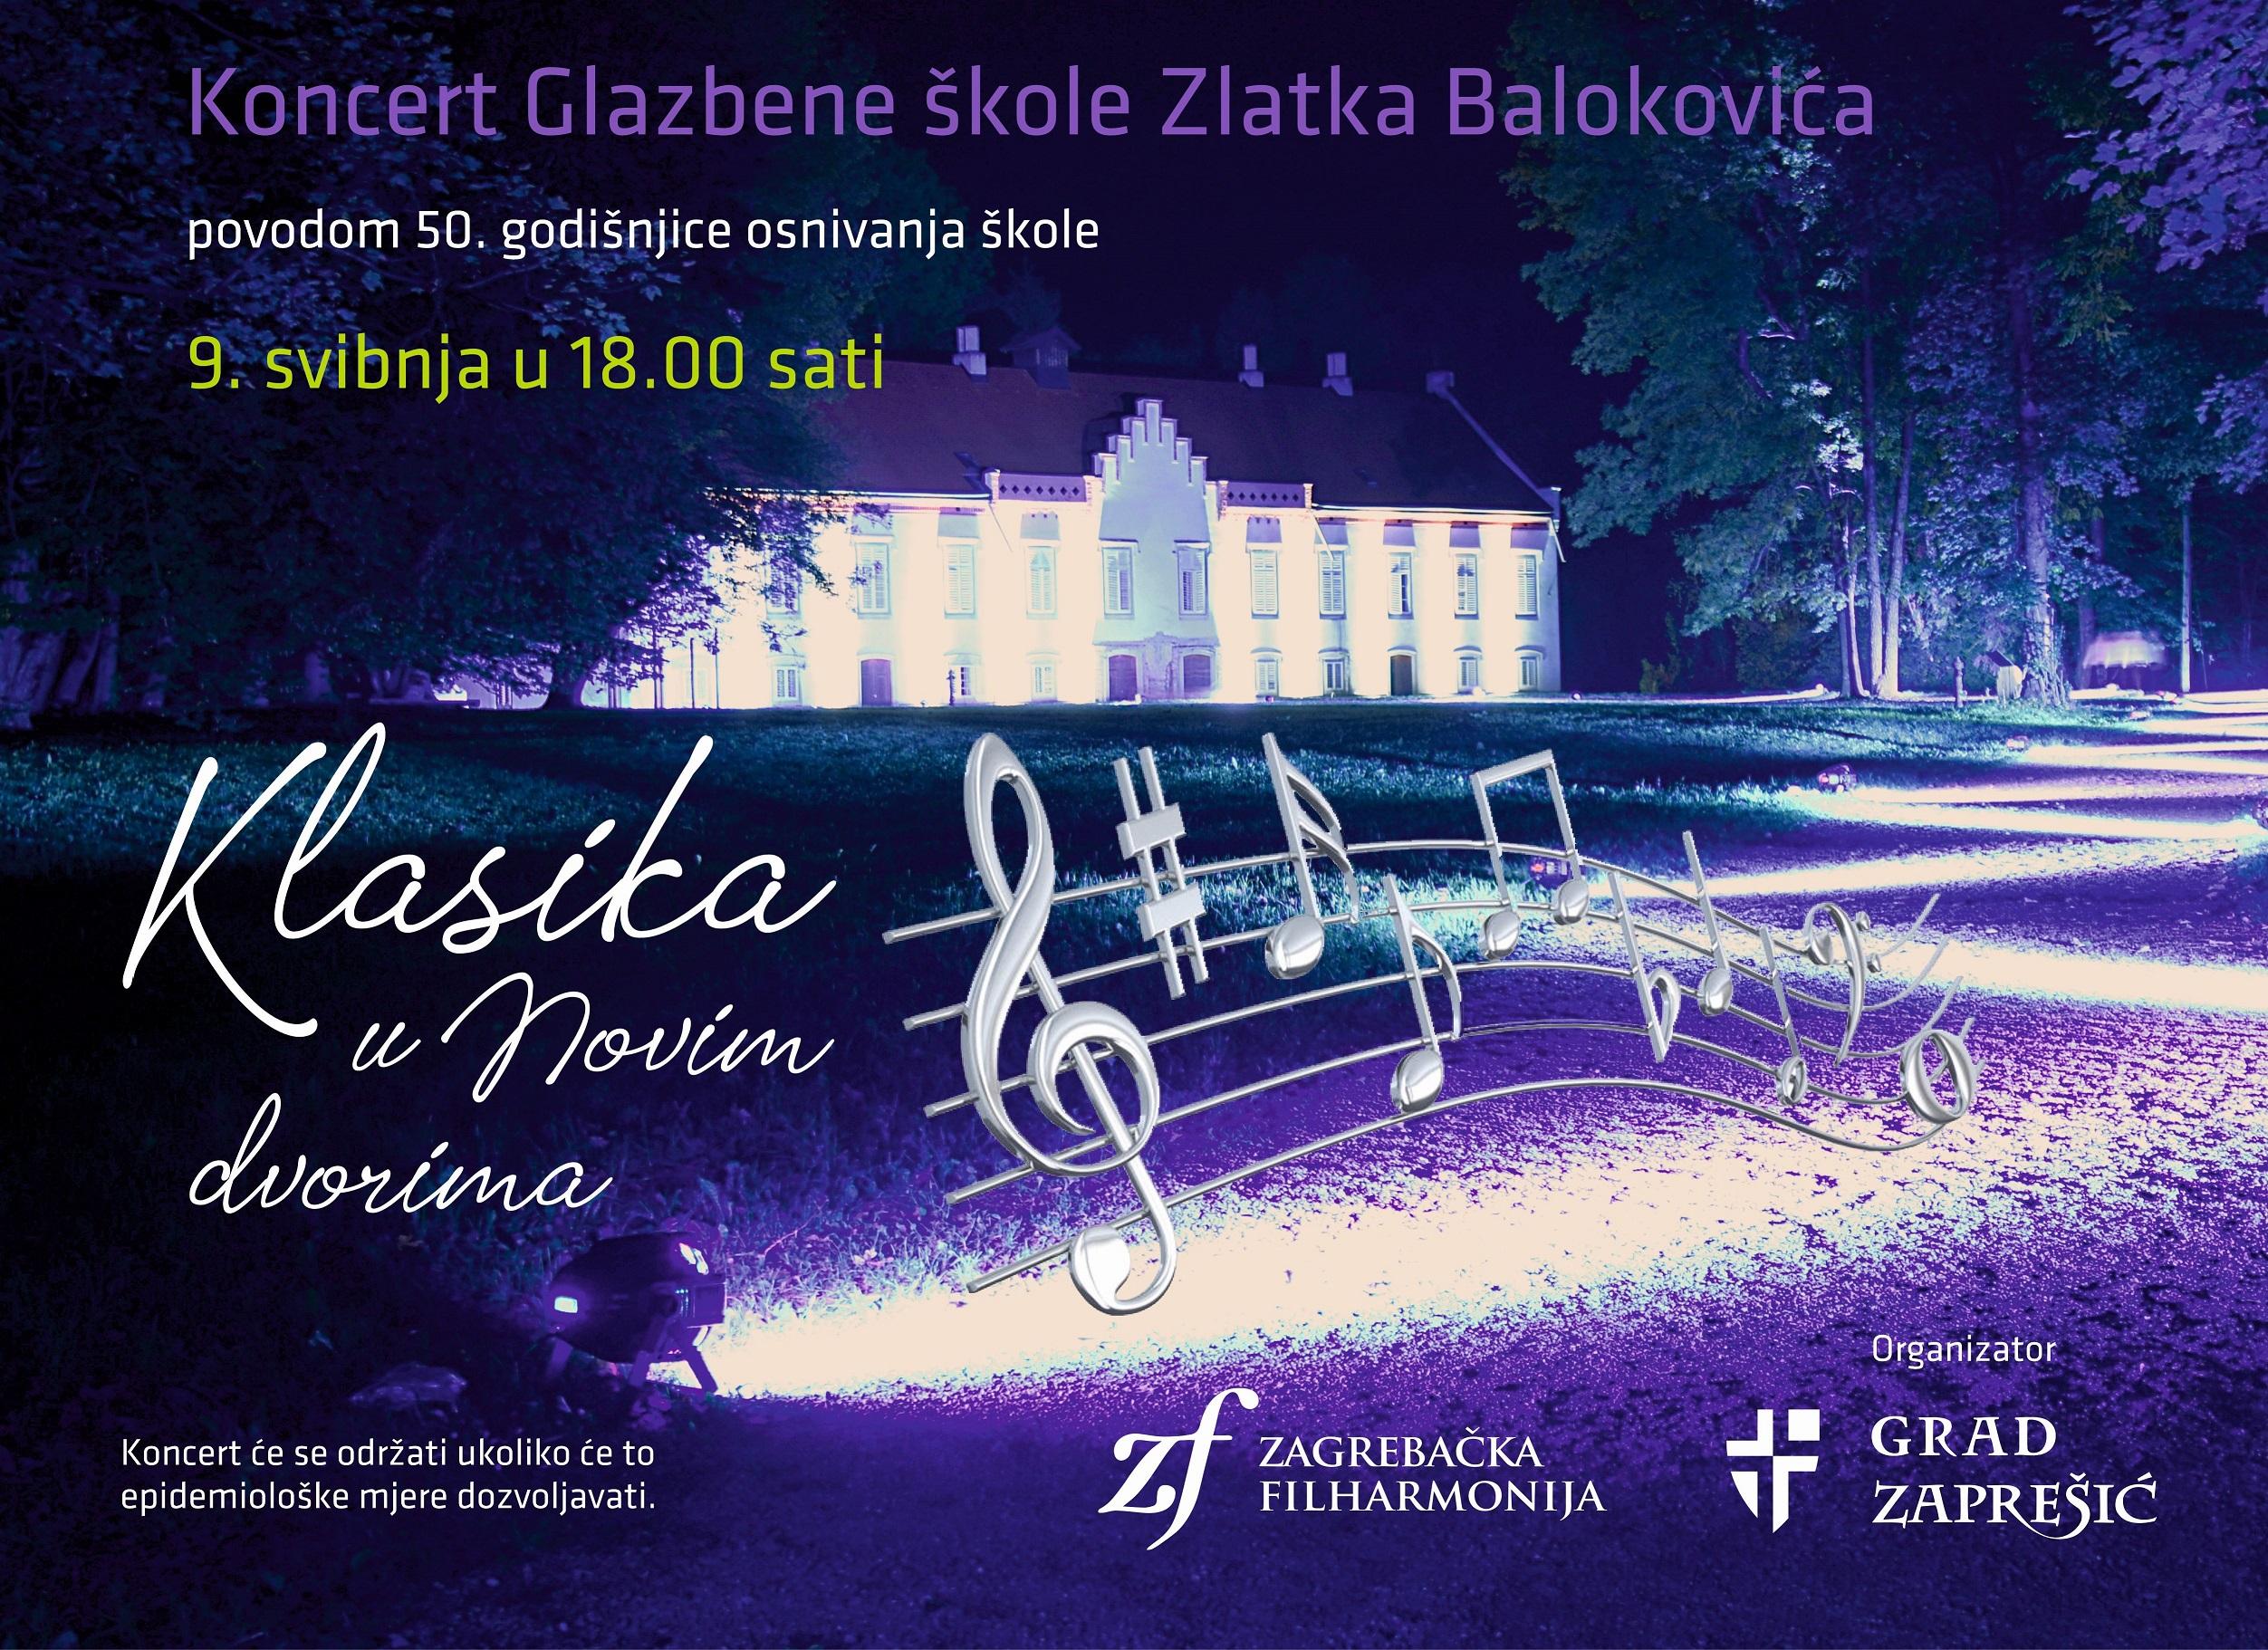 Koncert Zagrebačke filharmonije